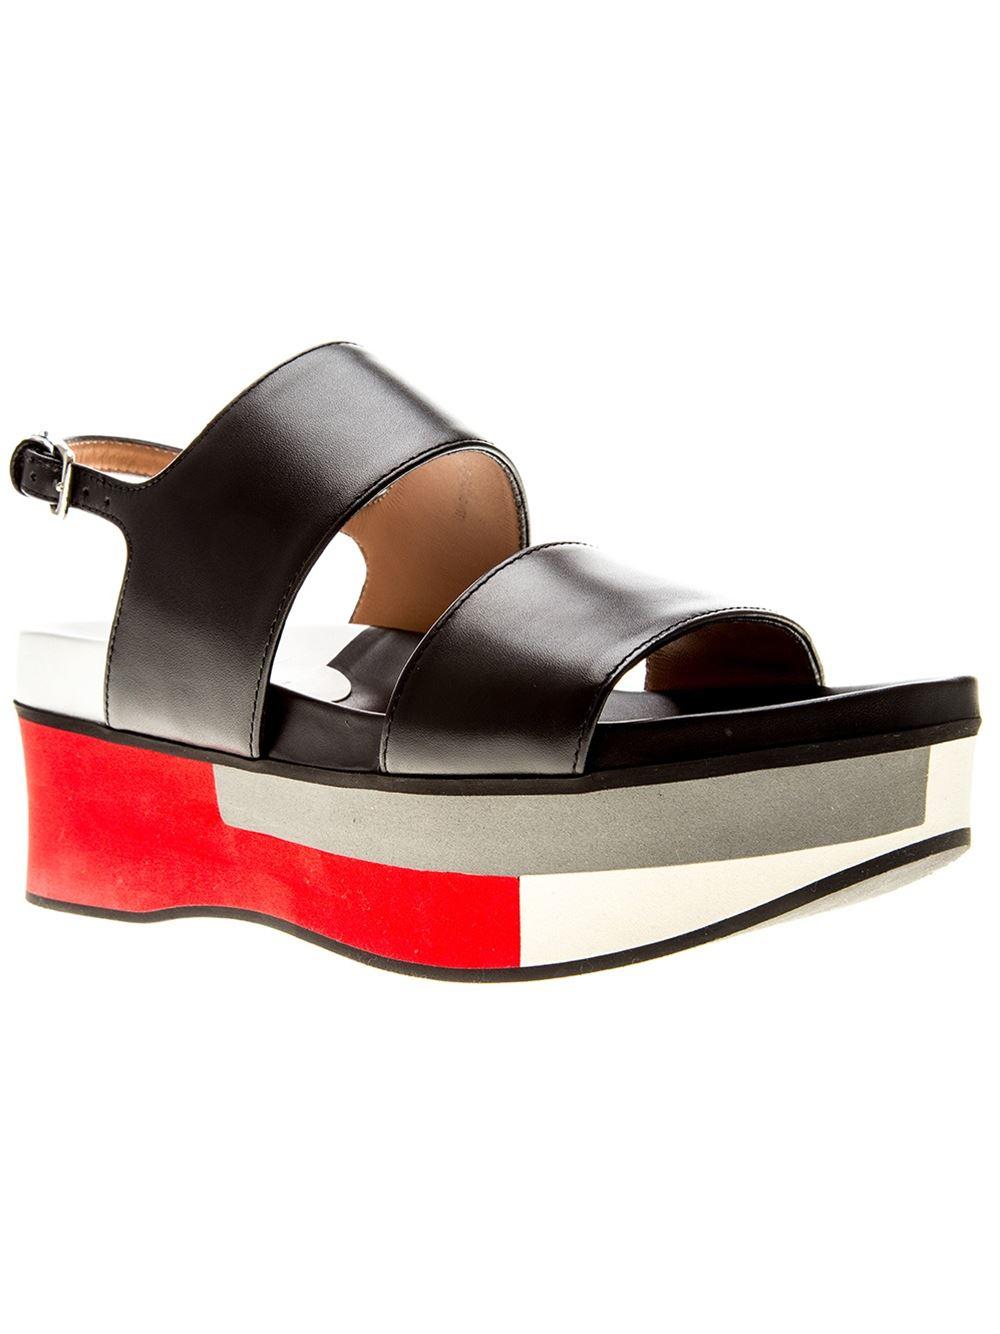 3e1ac6c4269 Lyst - Marni Colour Block Platform Sandals in Black